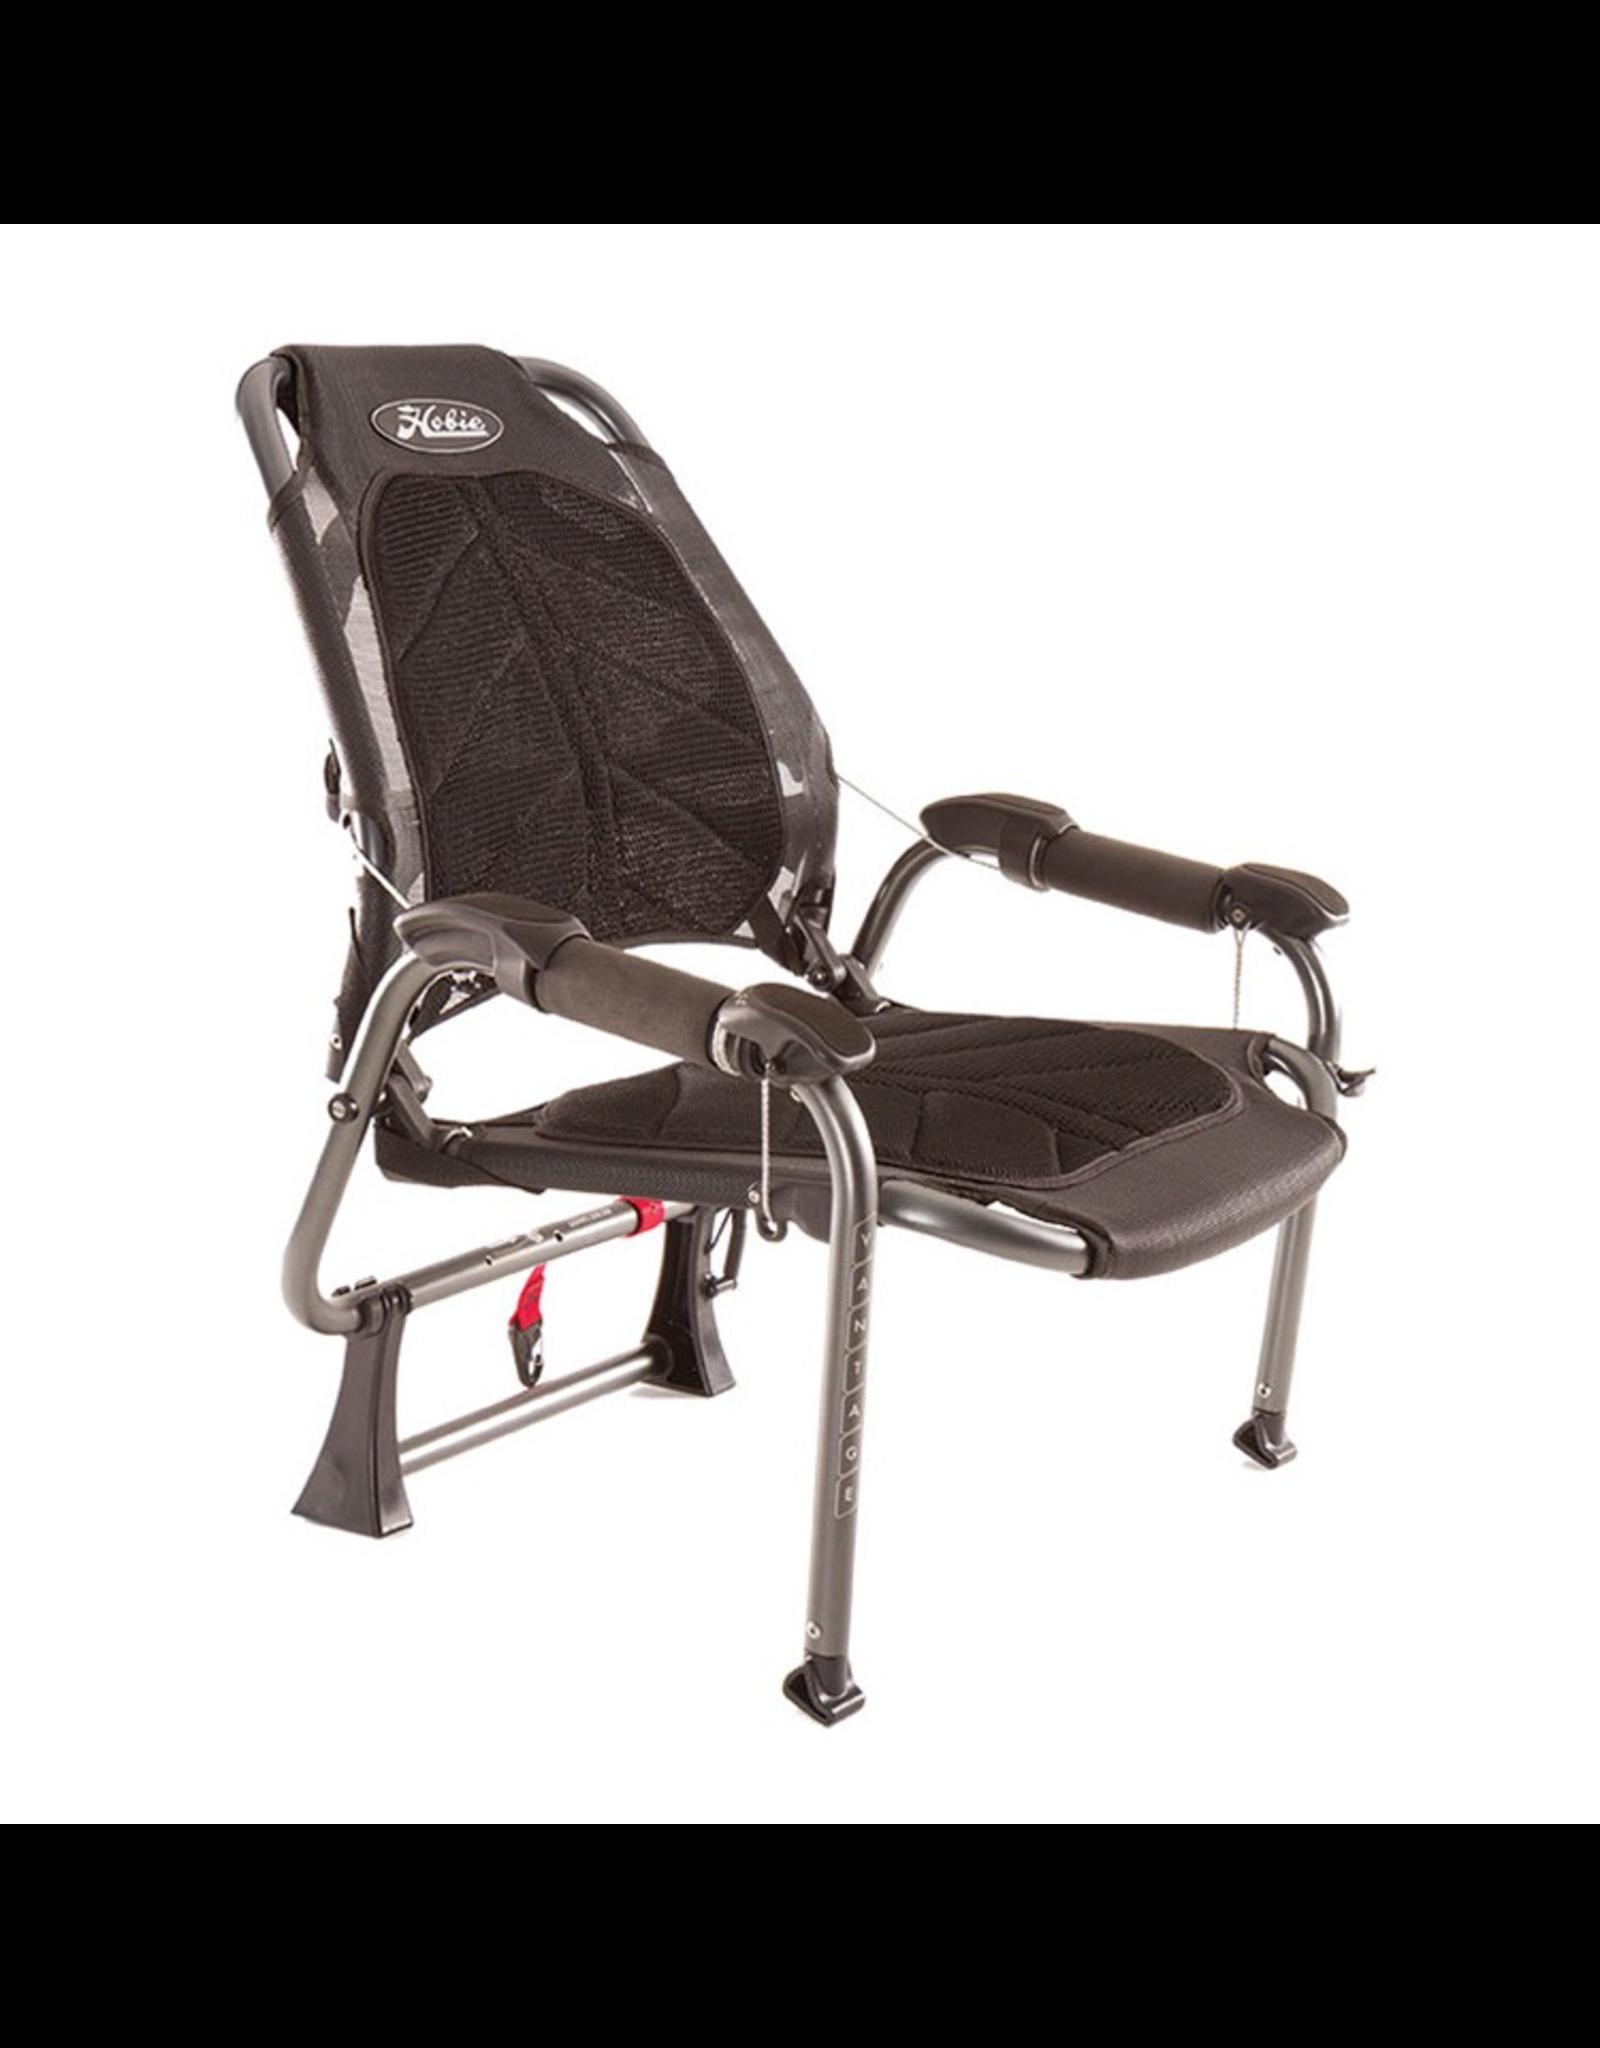 Hobie Hobie Vantage XT Chair - For Hobie Pro Angler 17